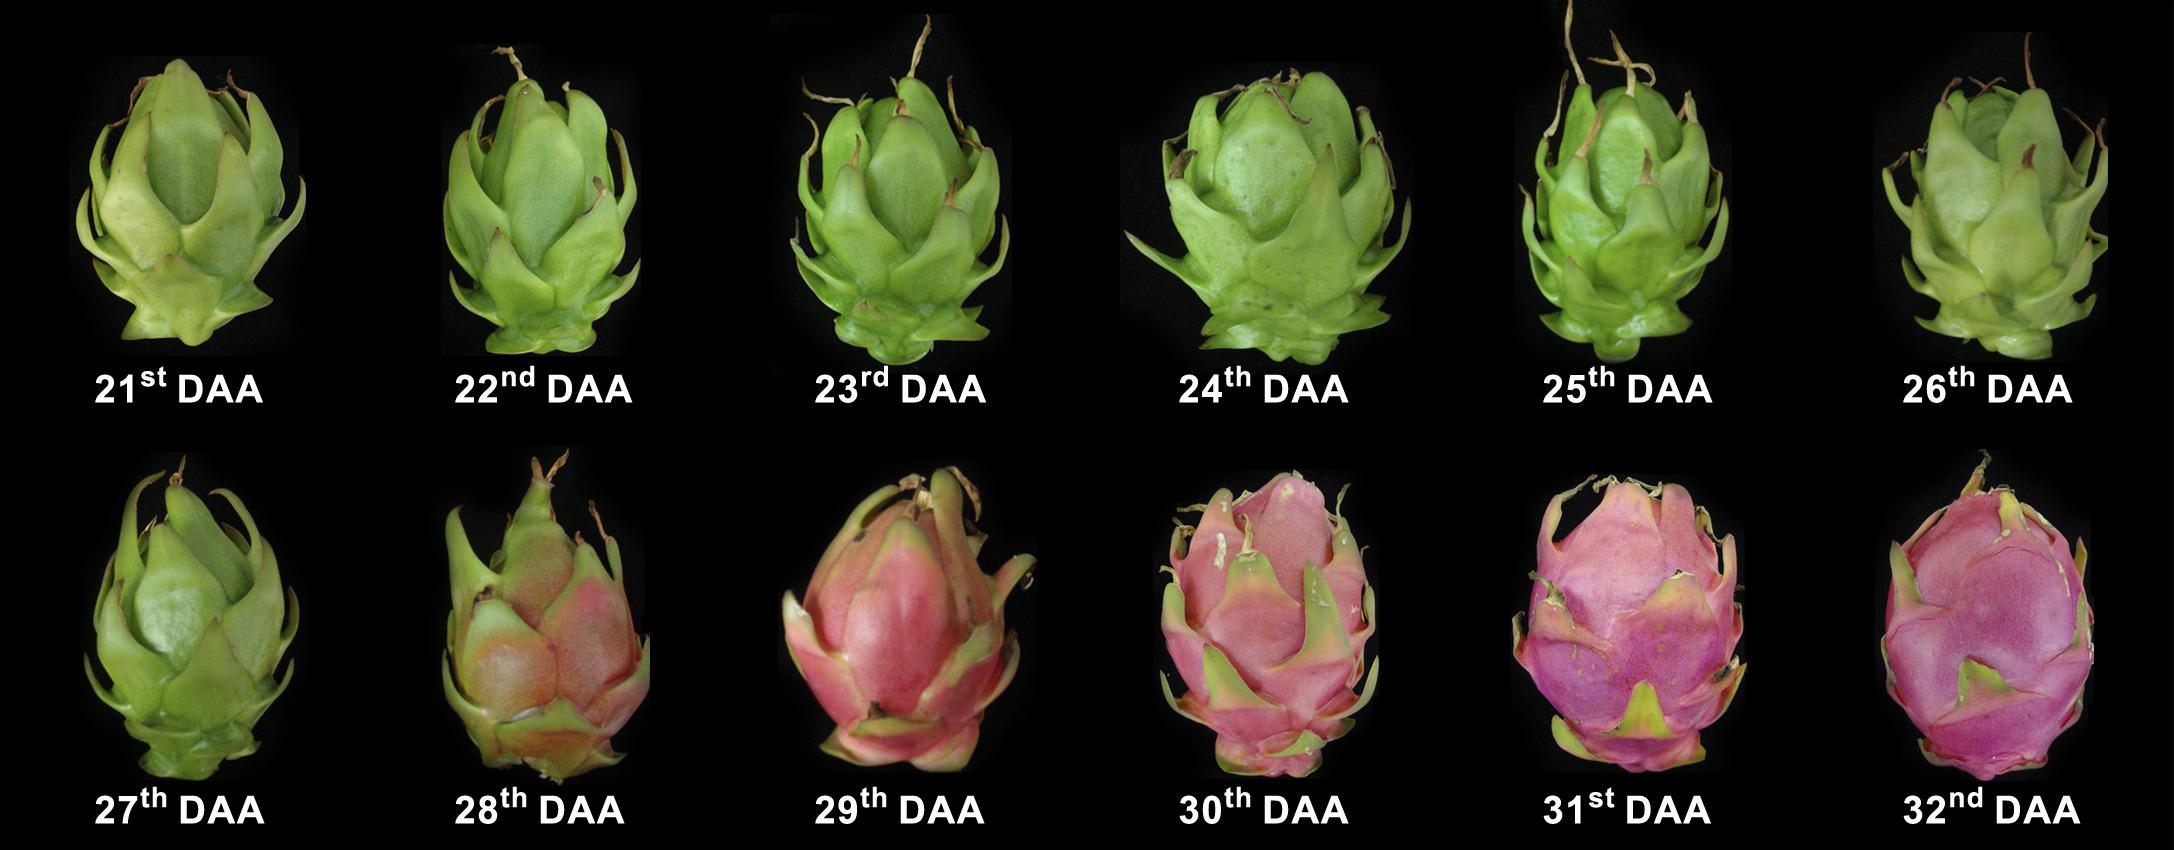 Physiological maturity of pitaya fruits Photo: T.A. Ortiz